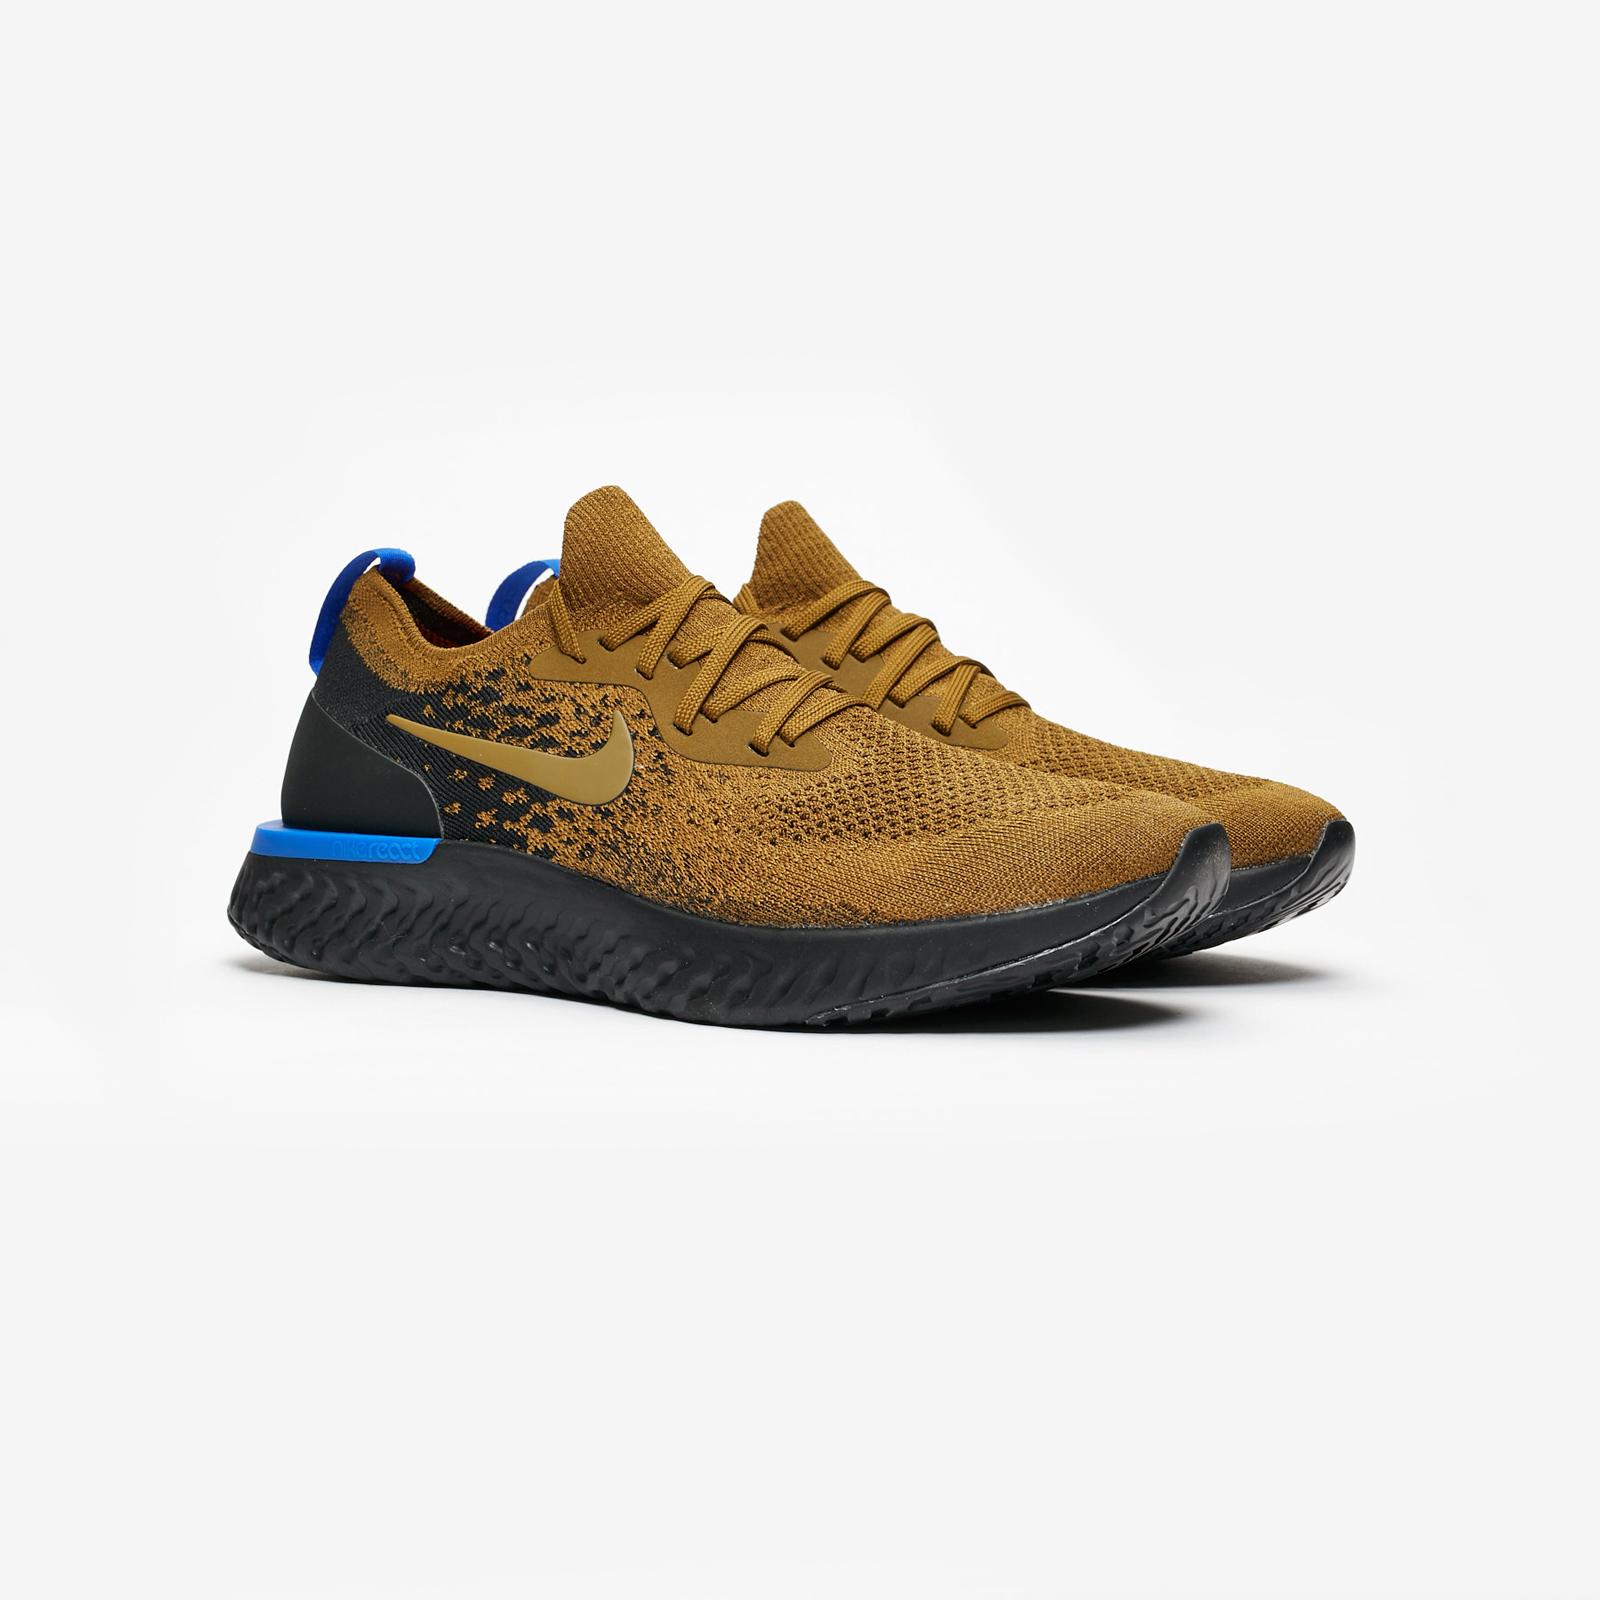 6bb91b1bdde9b Nike Epic React Flyknit - Aq0067-301 - Sneakersnstuff